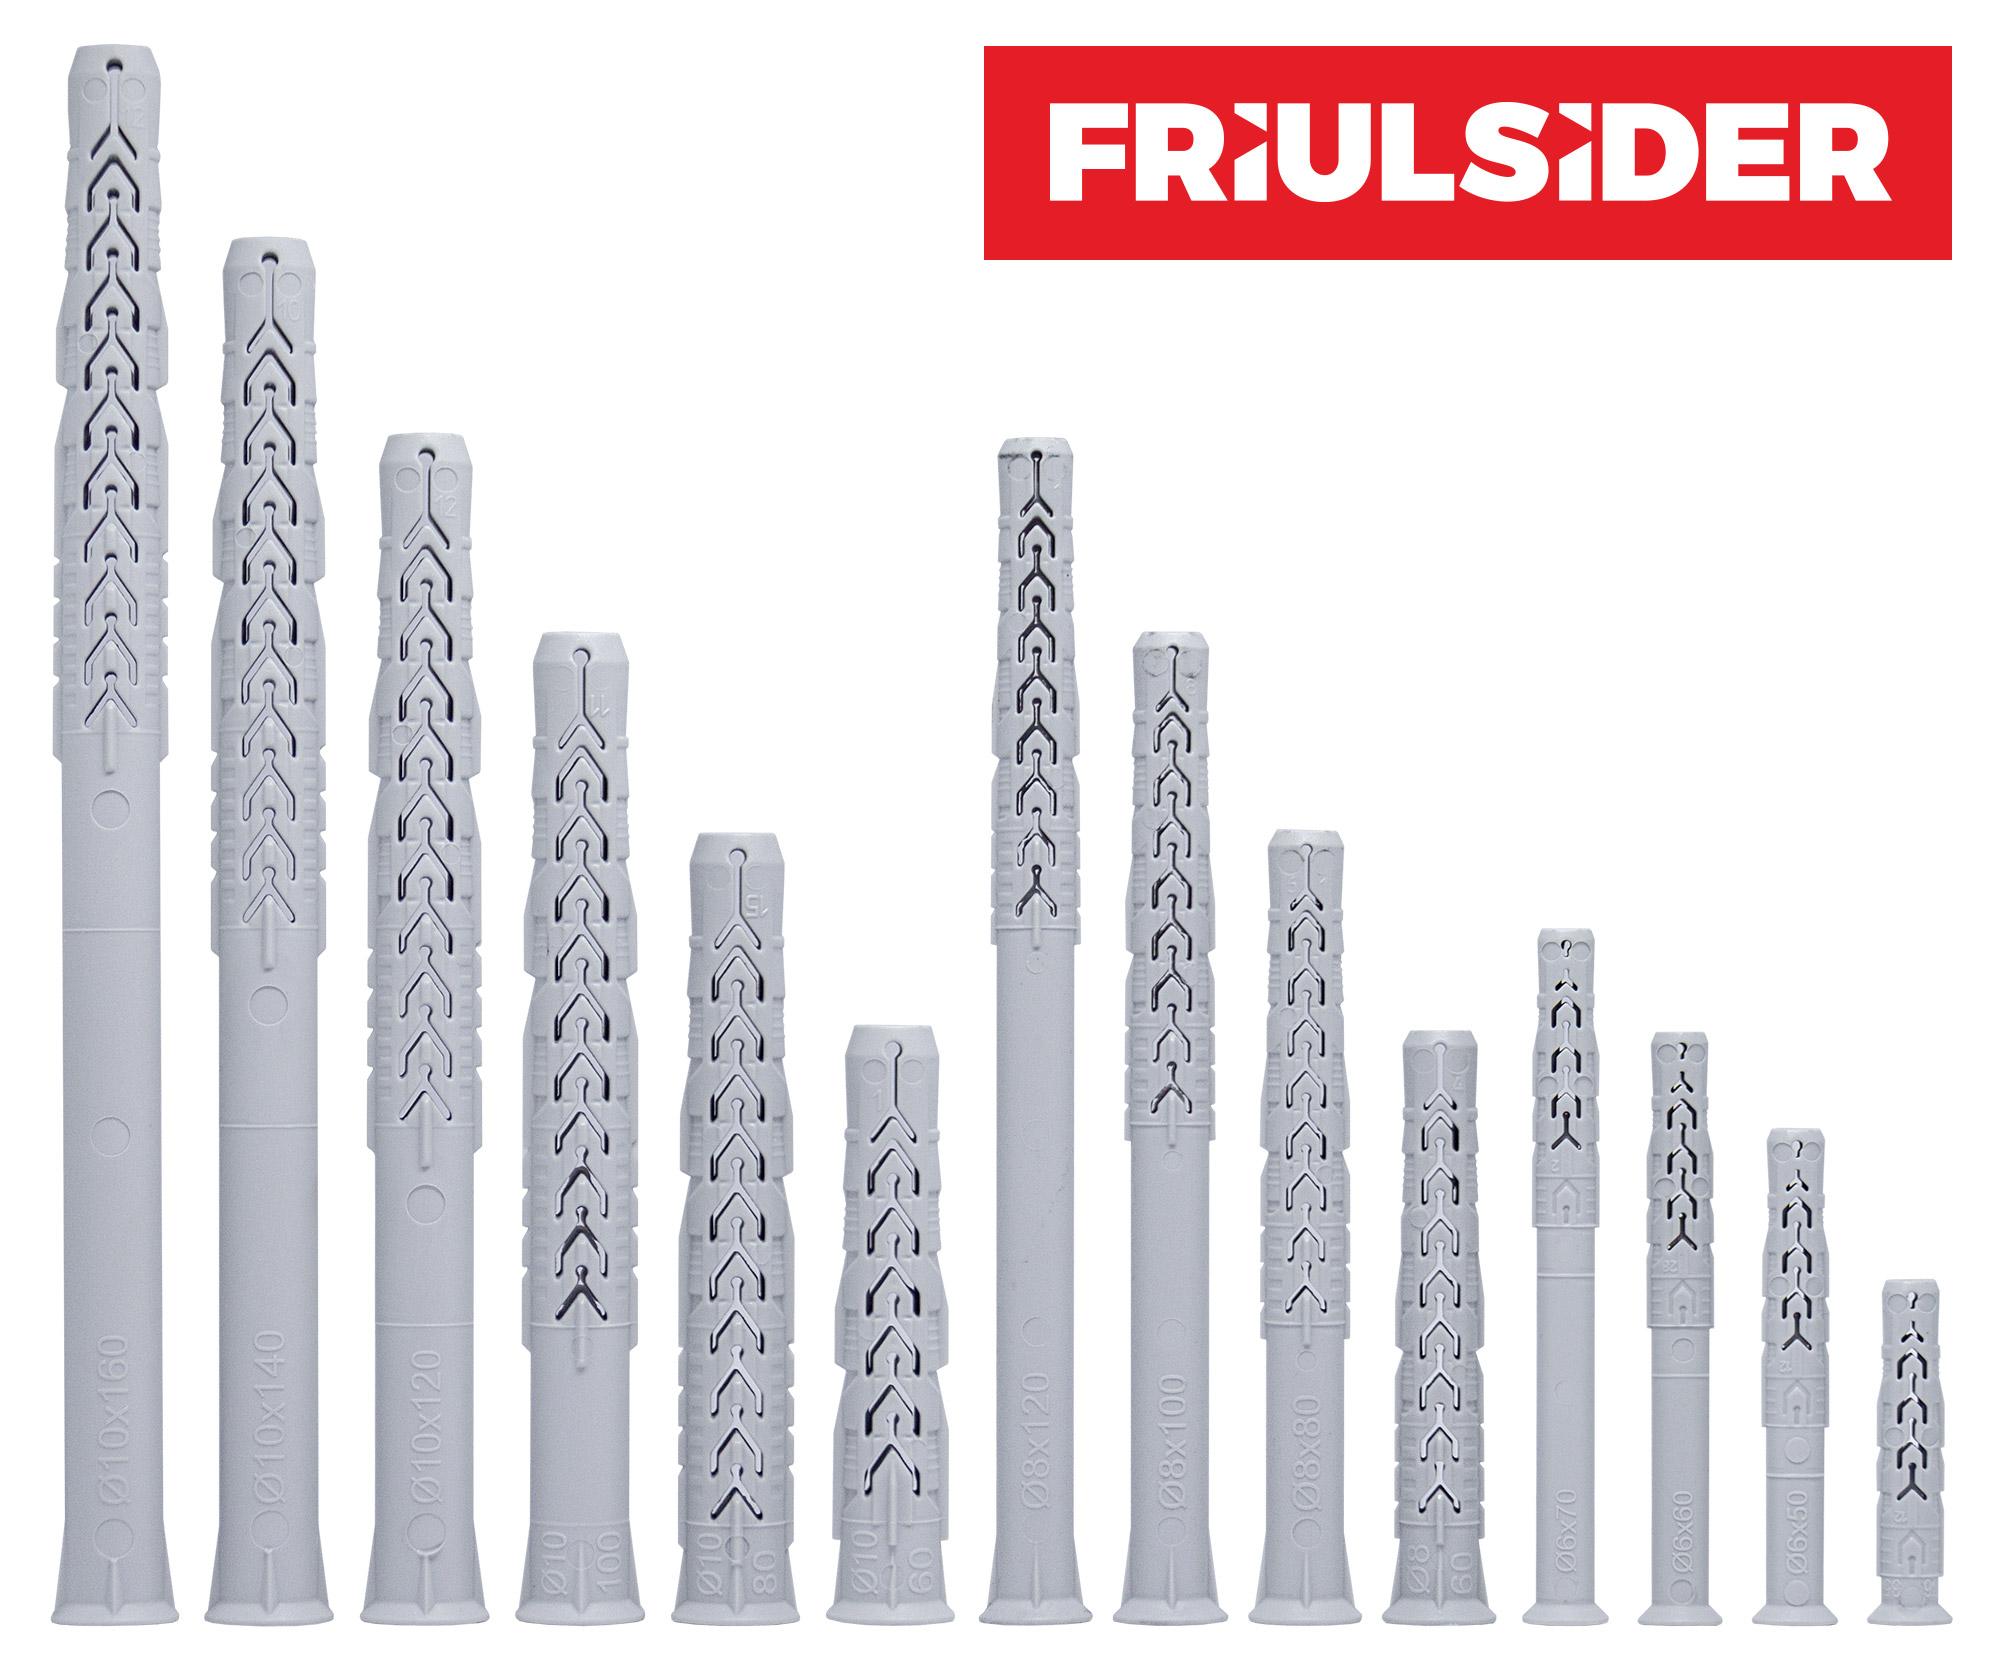 Friulsider najlonski tiplovi X3